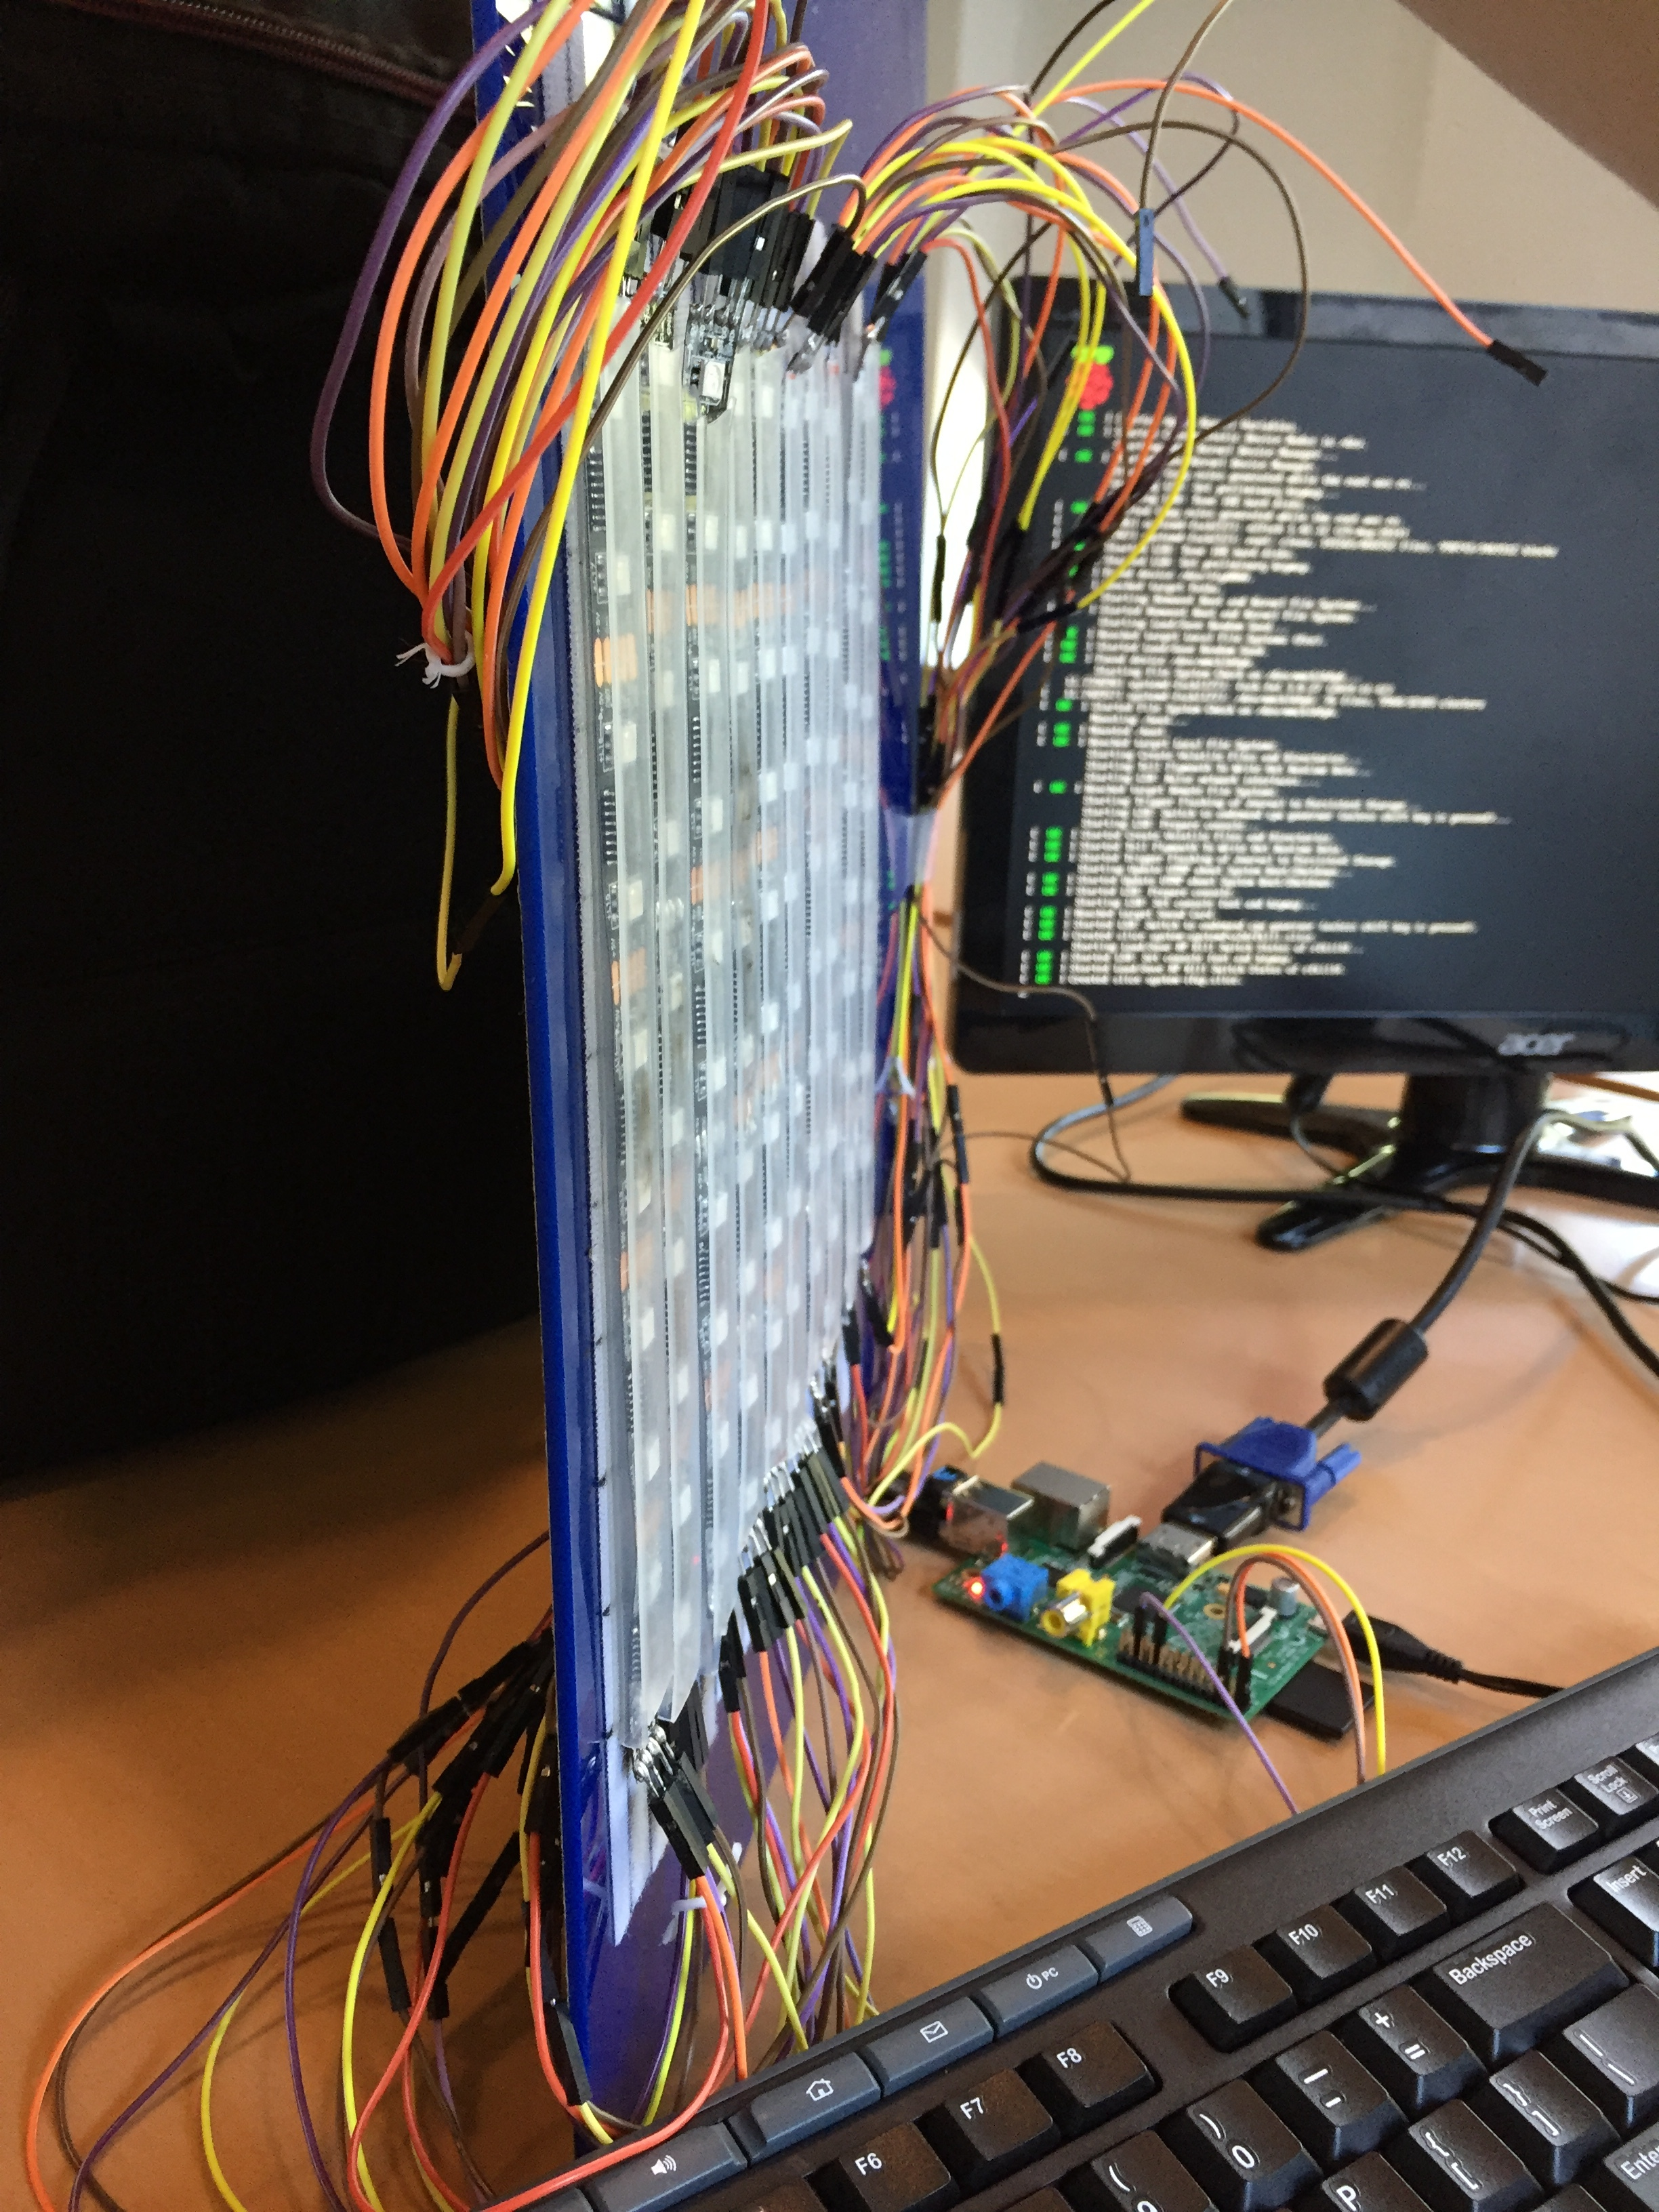 Redesigning Smart Lamp Maker Kit (Prototype)